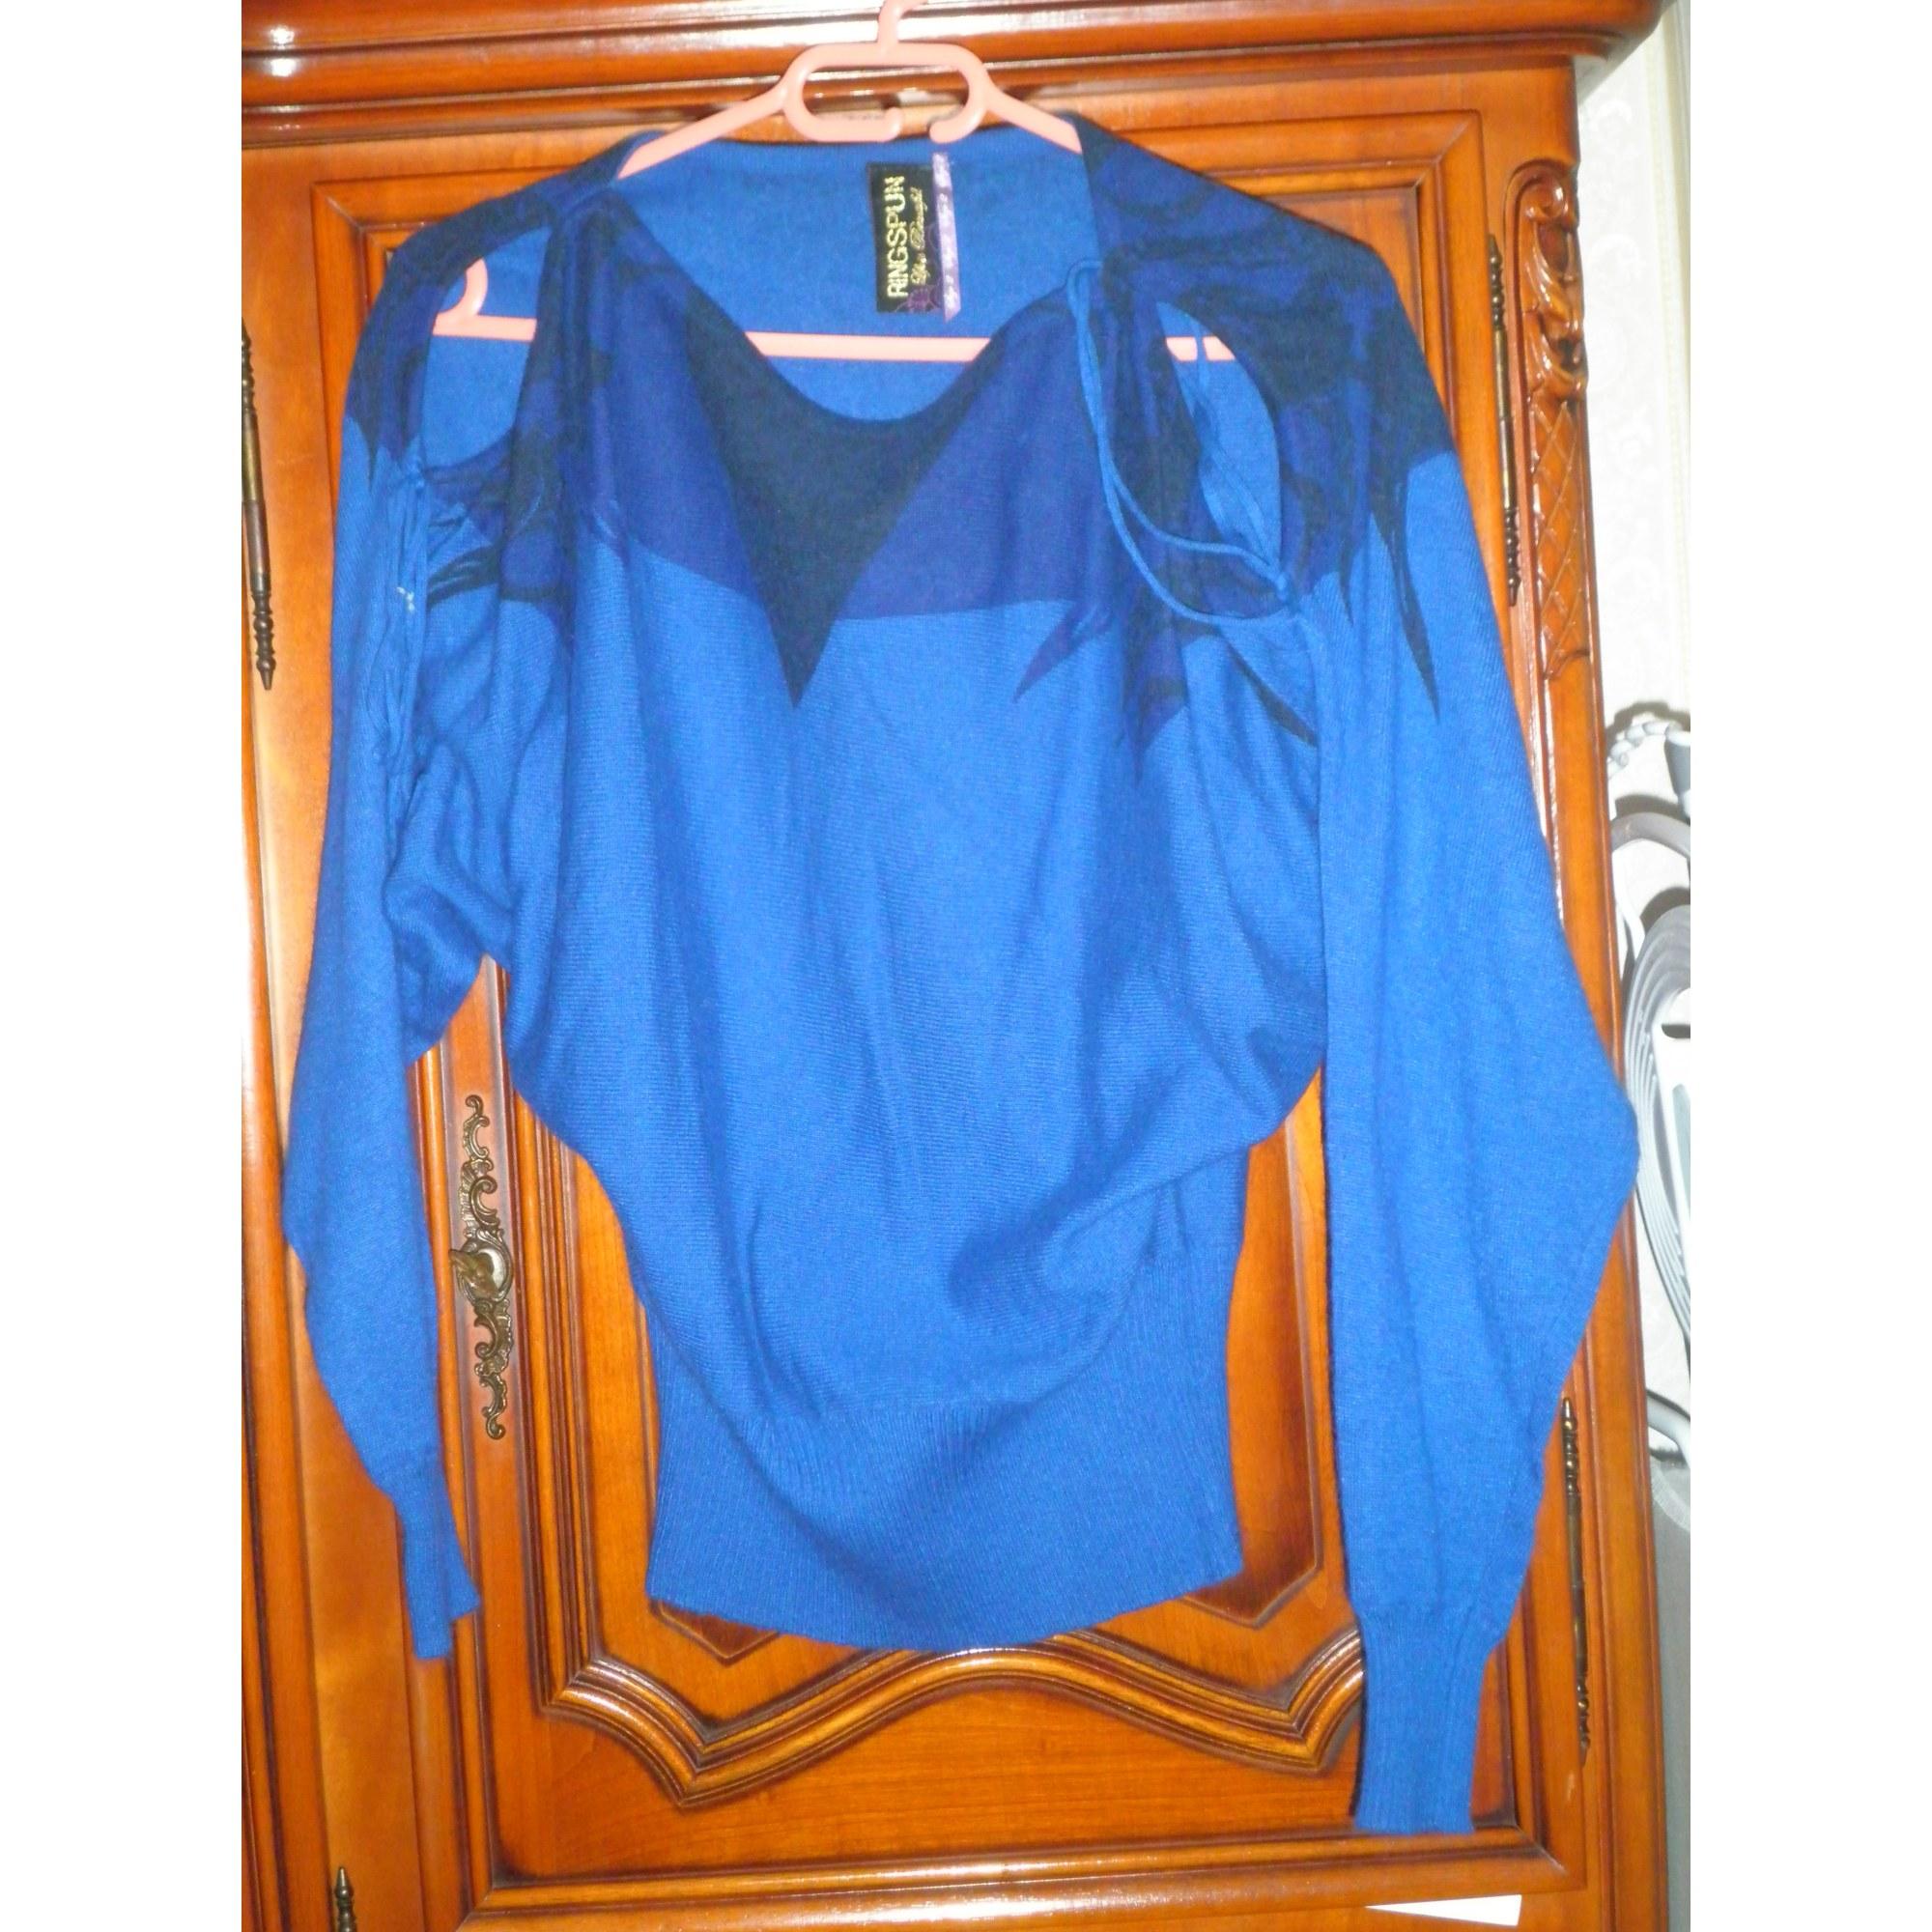 Pull ASOS Bleu, bleu marine, bleu turquoise